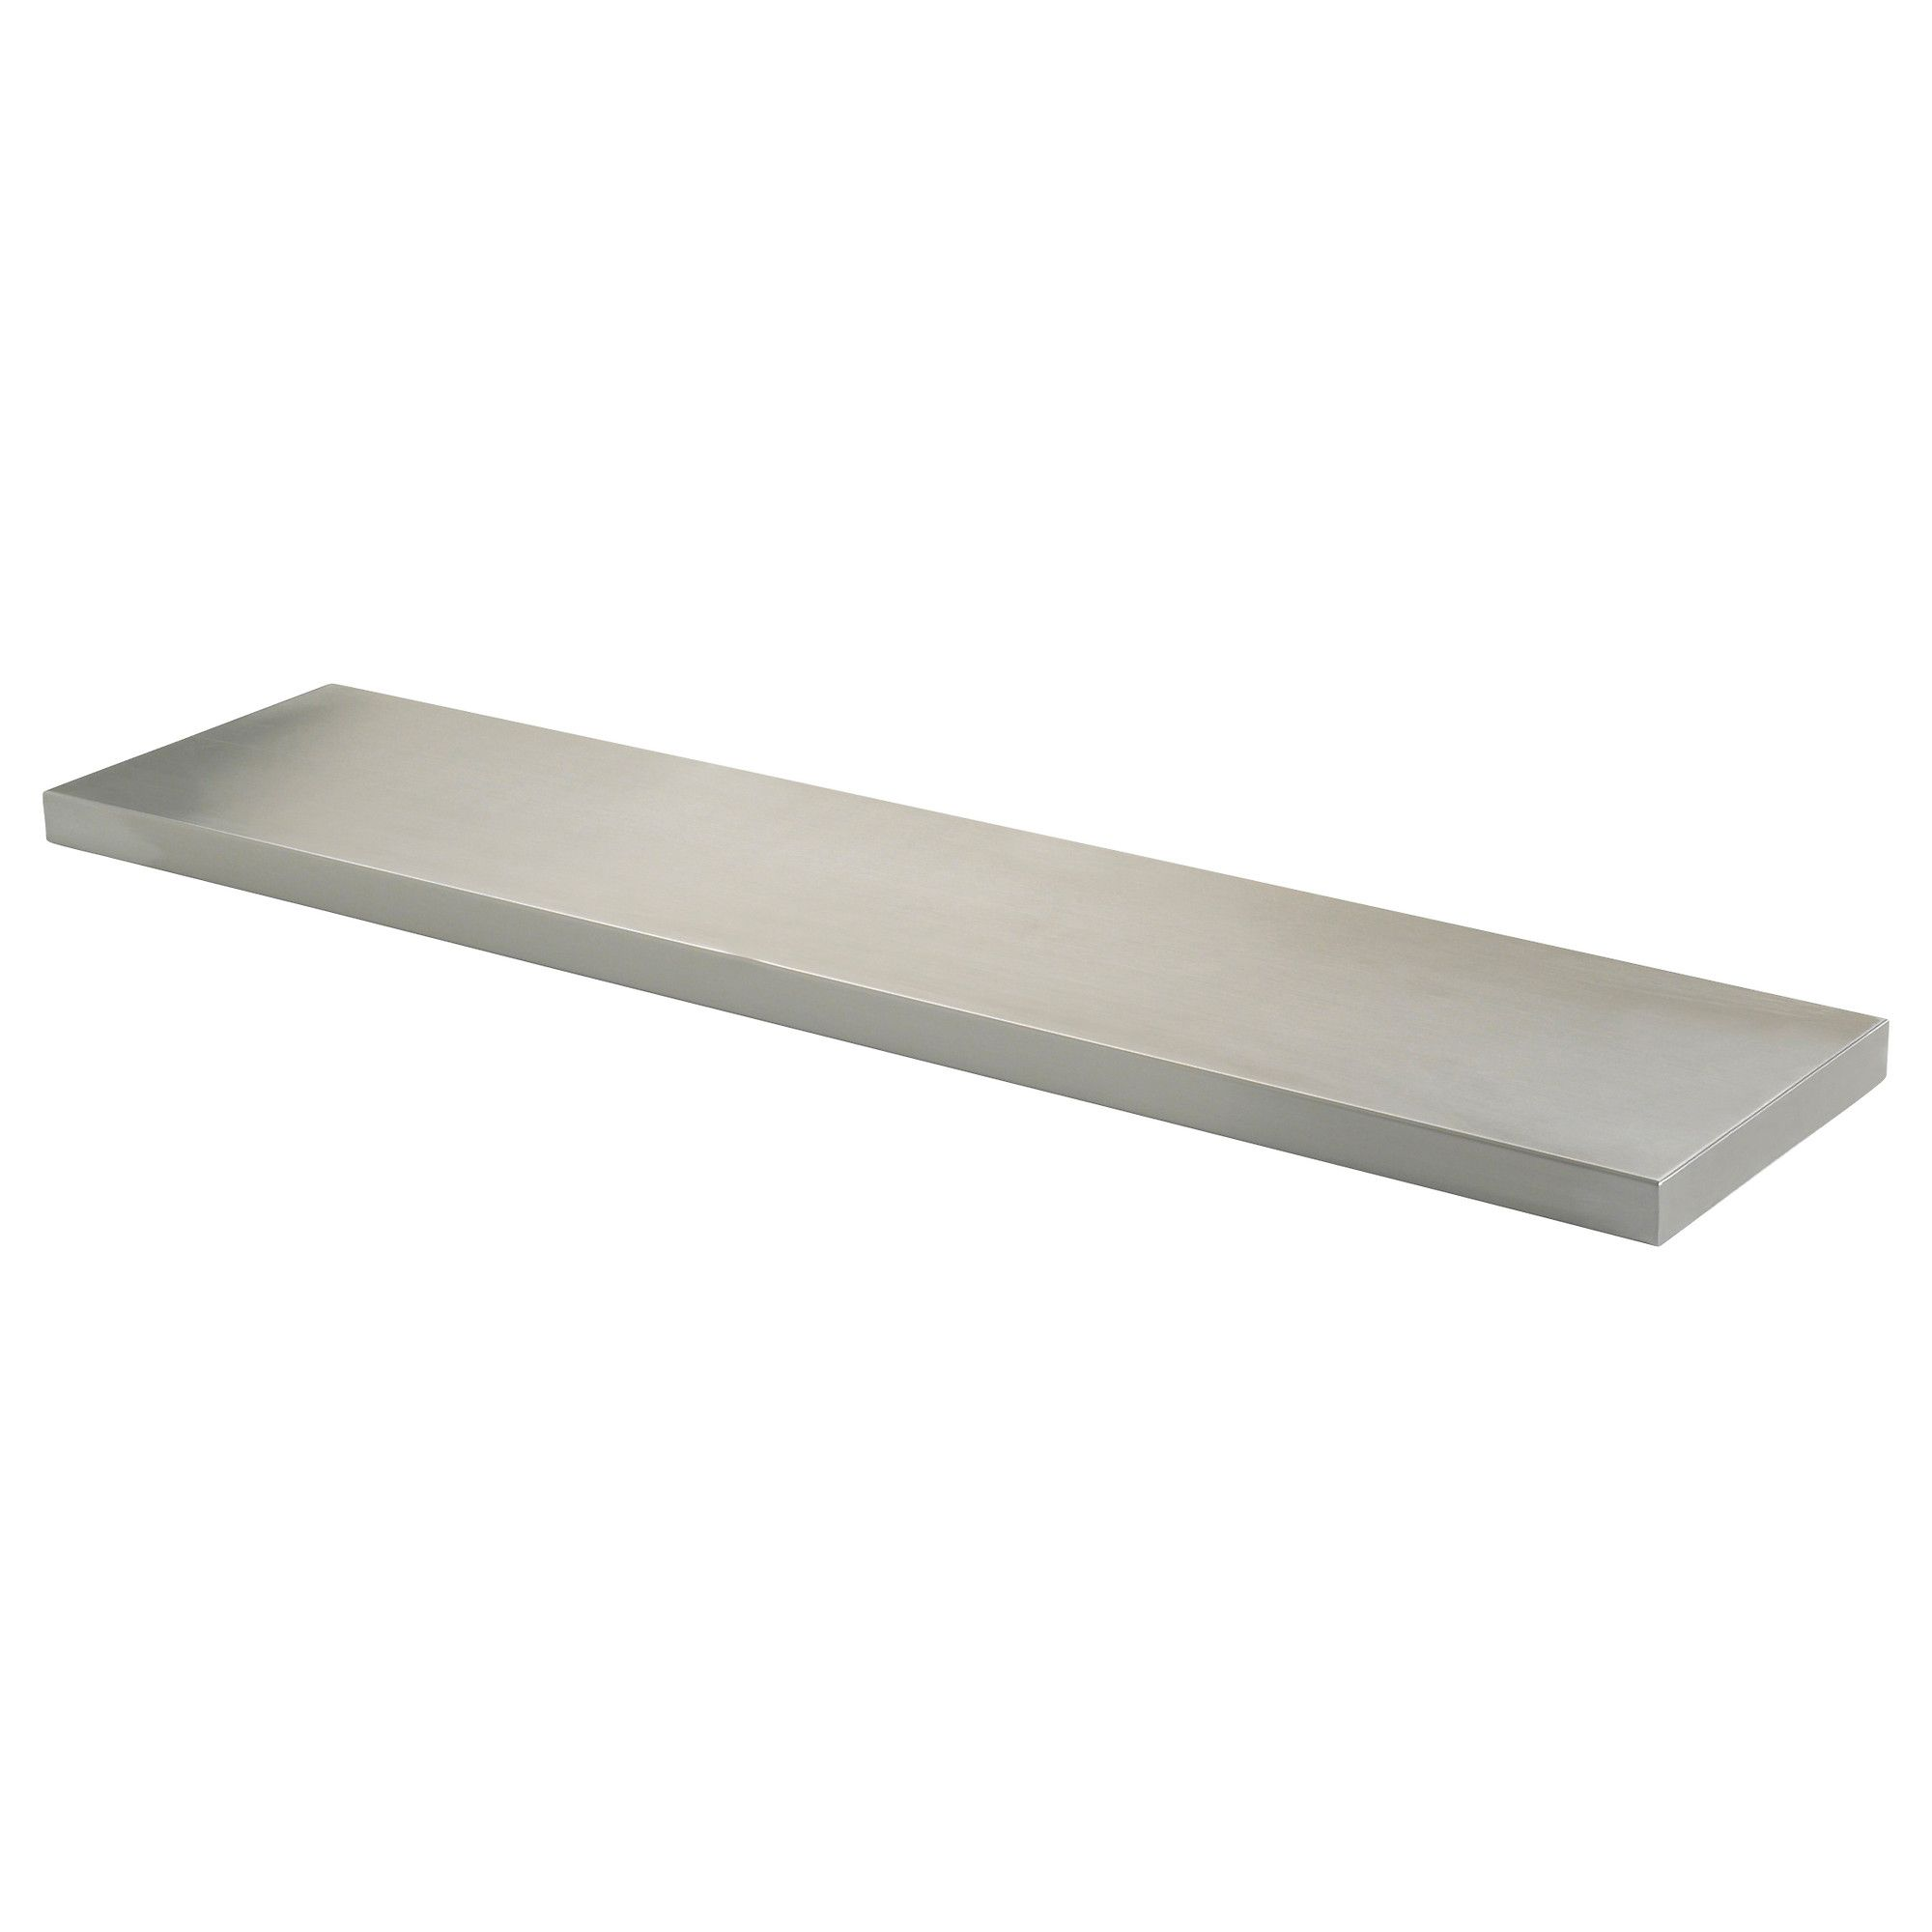 Ikea Us Furniture And Home Furnishings Steel Shelf Wall